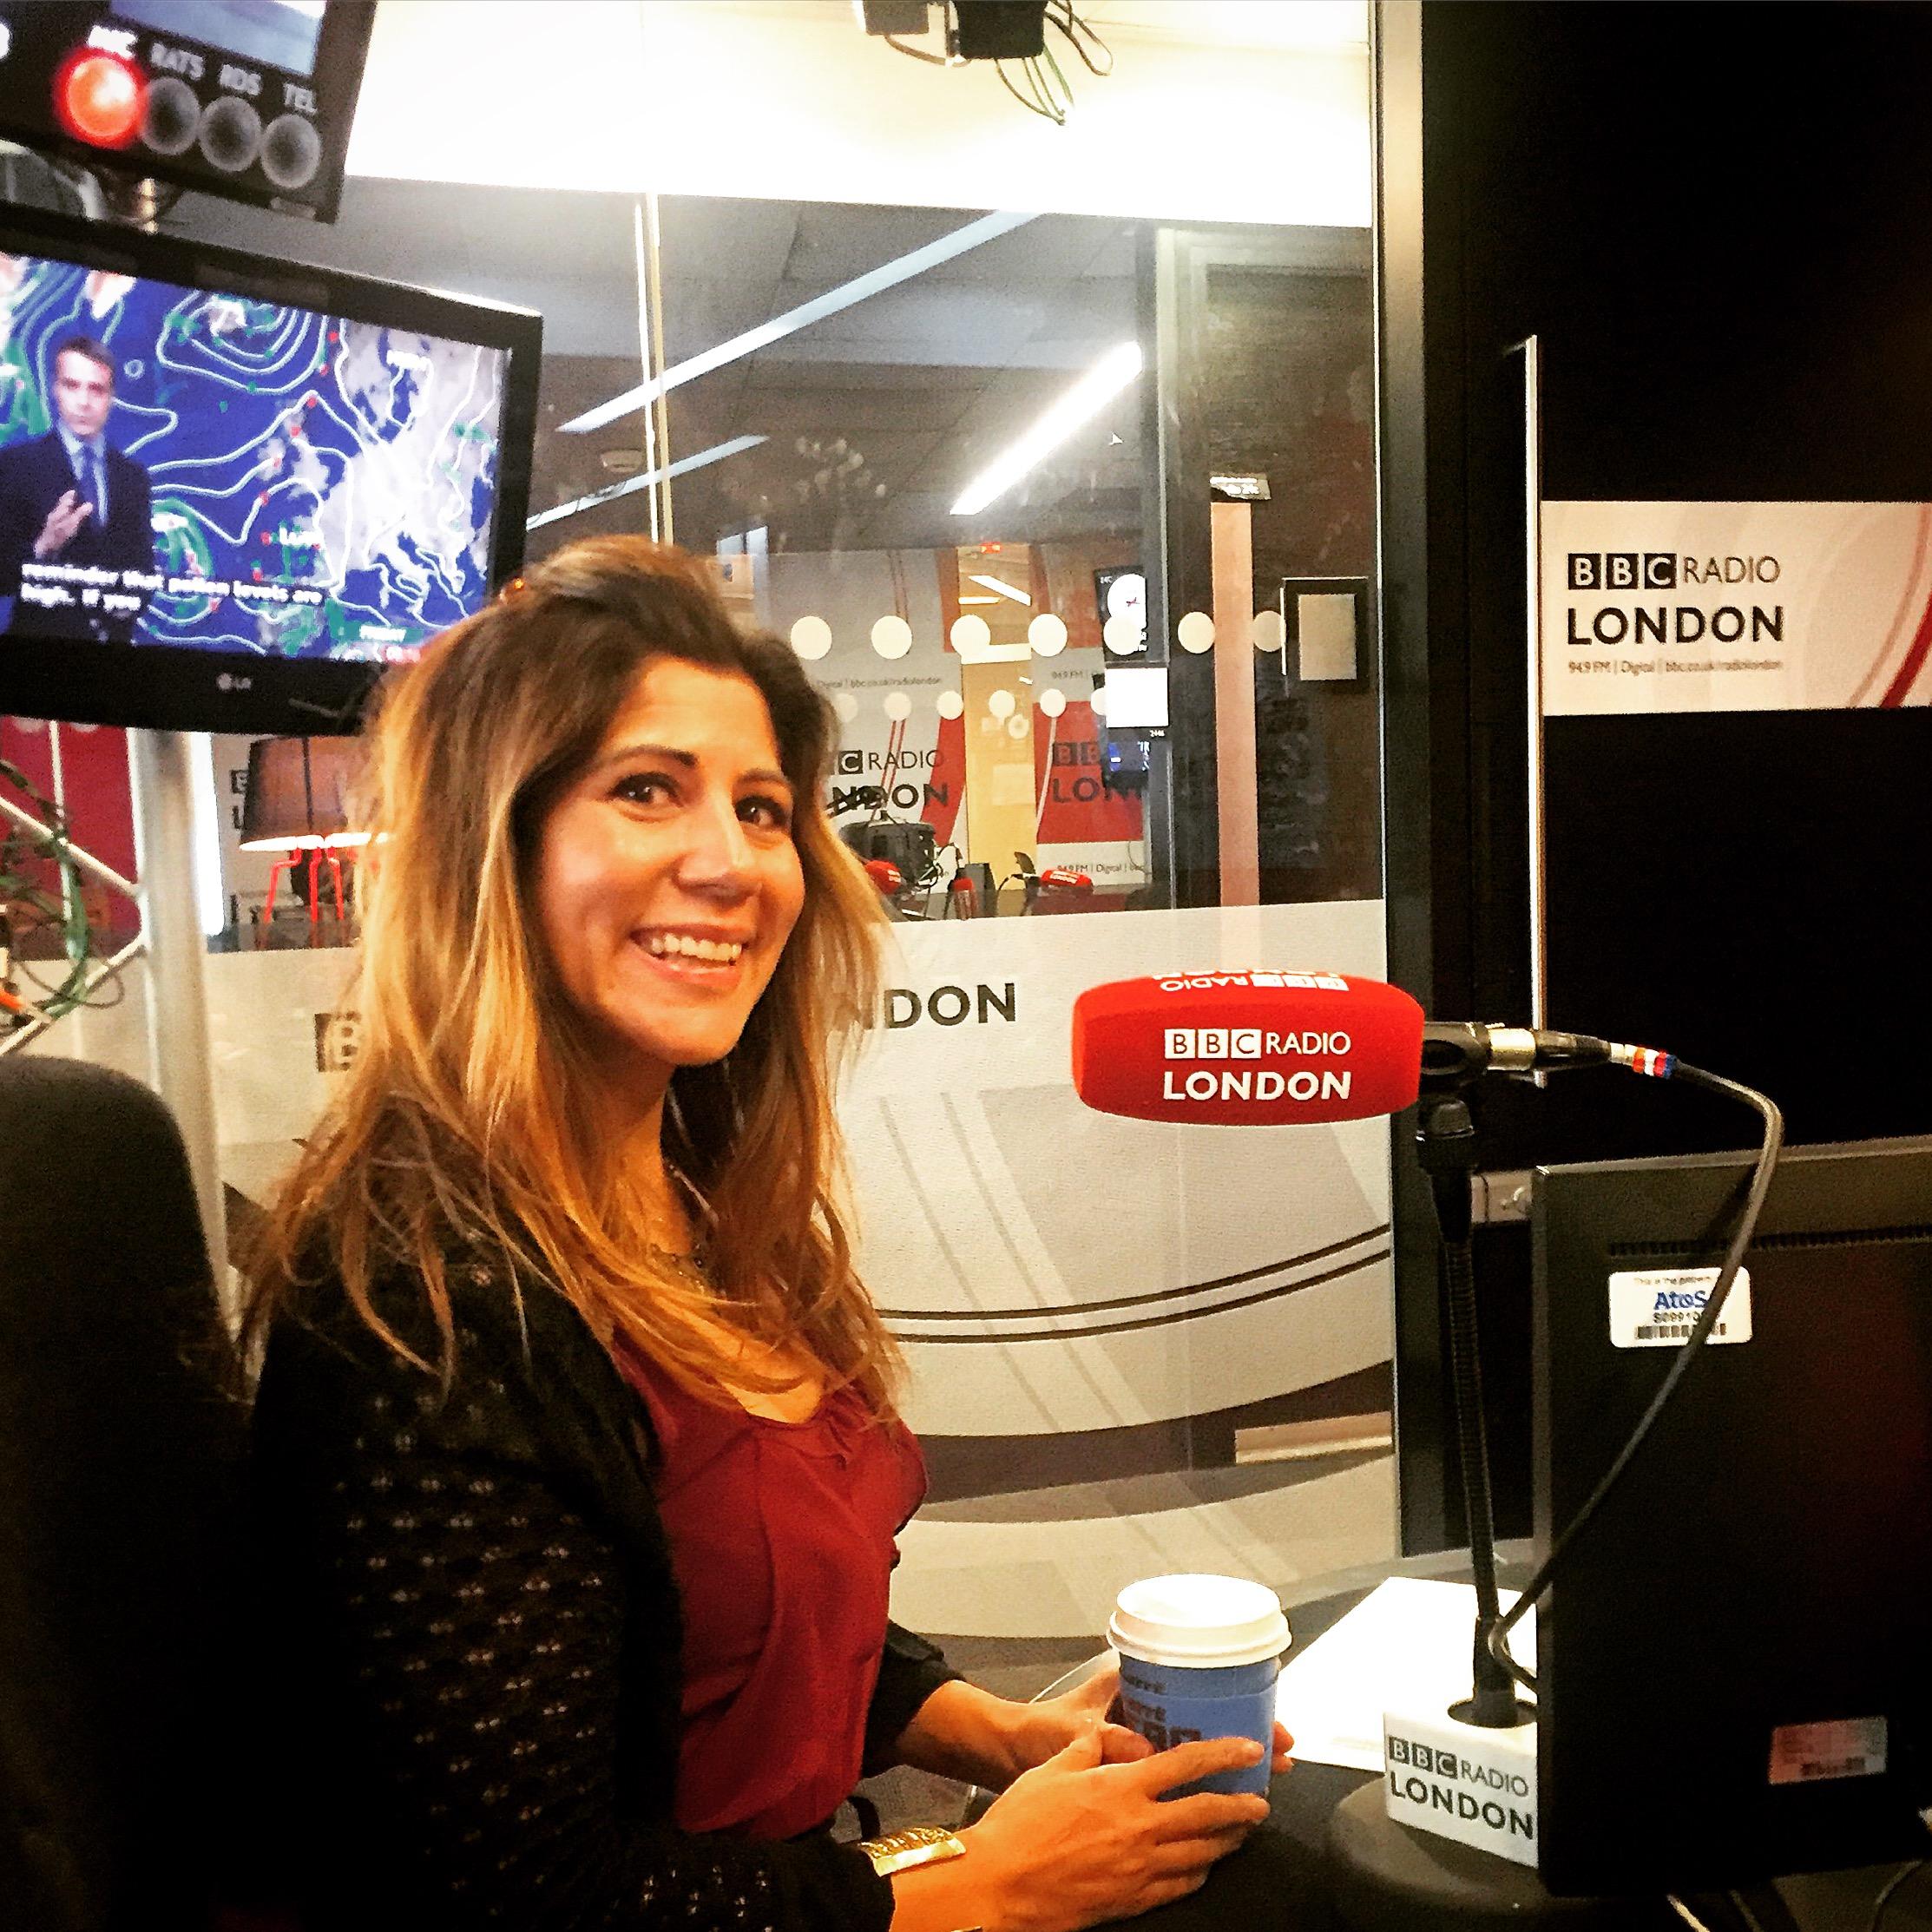 BBC Radio London, Vanessa Feltz Show